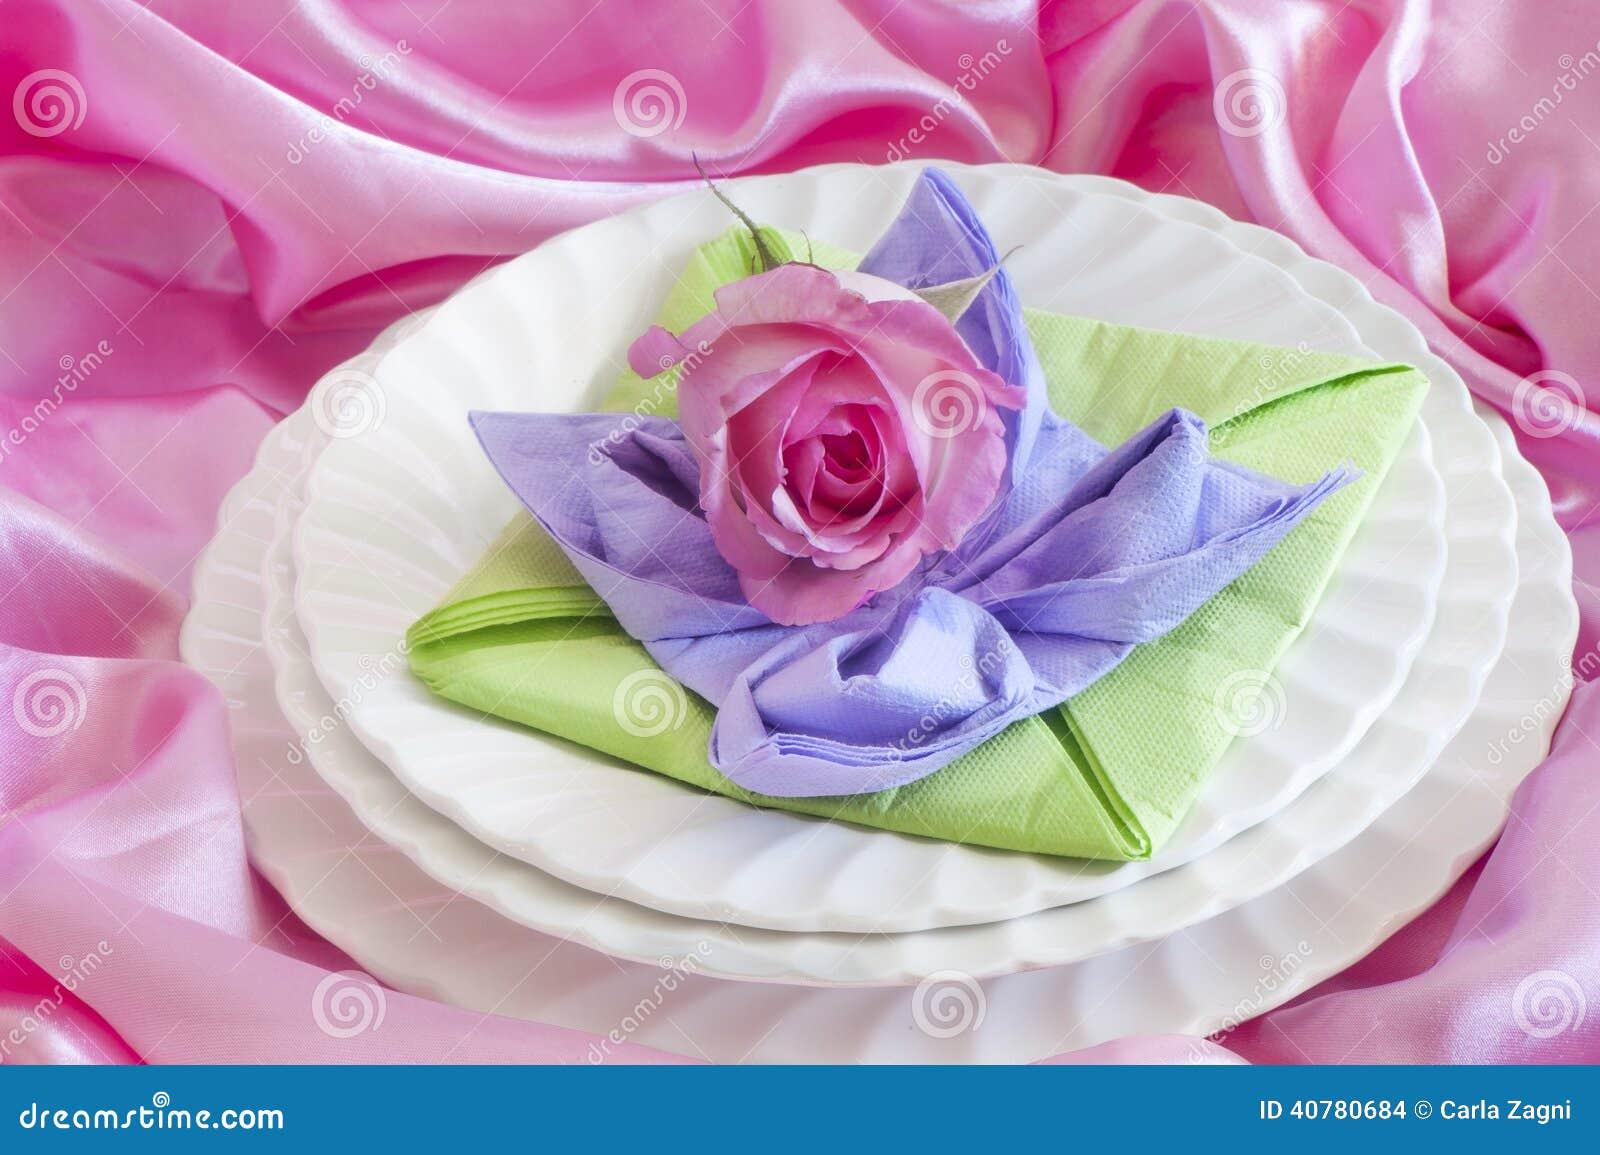 Elegant Origami Napkins Stock Photo Image Of Dinner 40780684